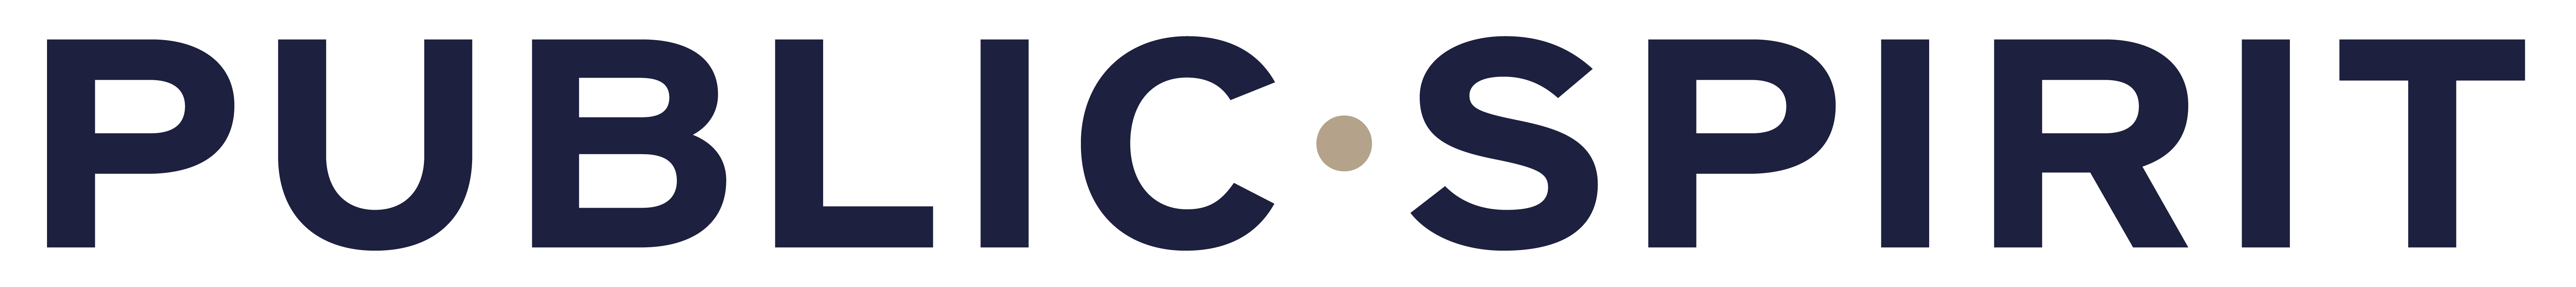 Traineeship Toezichthouden 2022